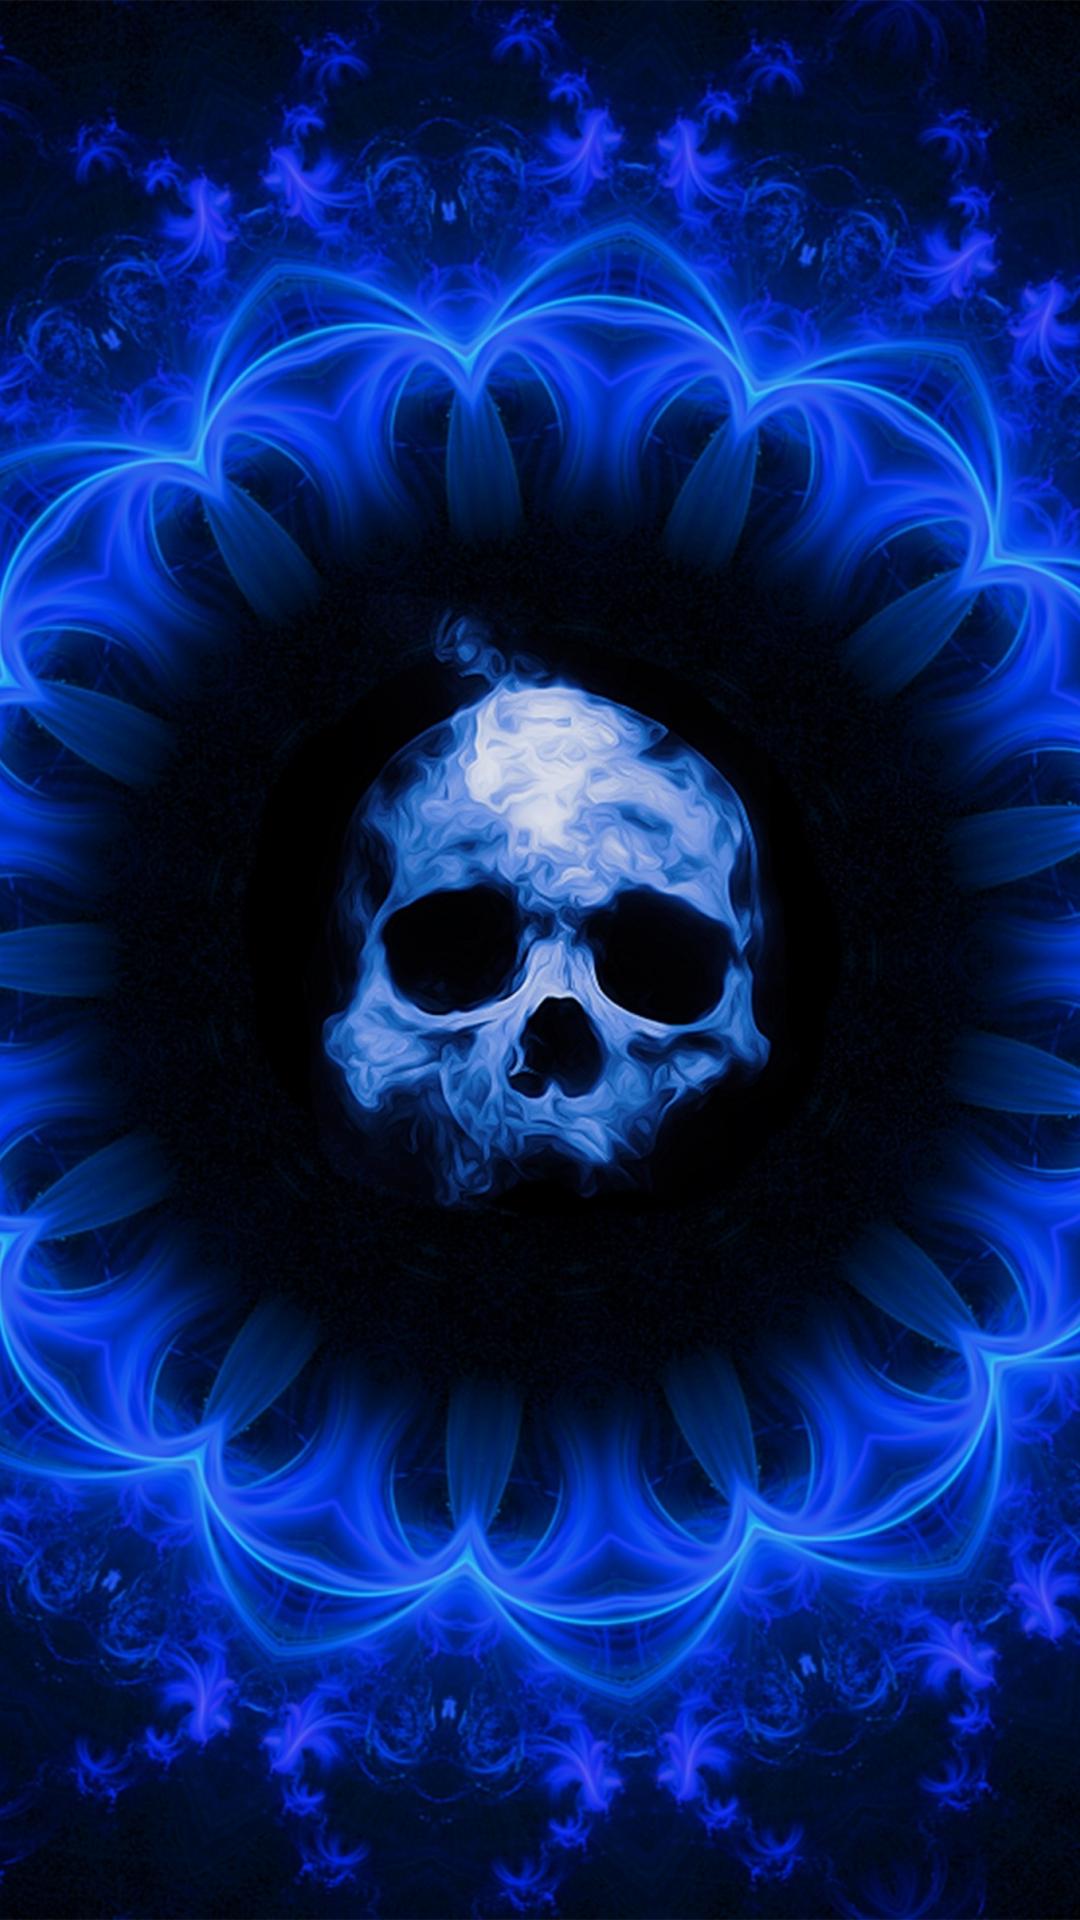 Download 1080x1920 Wallpaper Skull Dark Blue Gothic Abstract